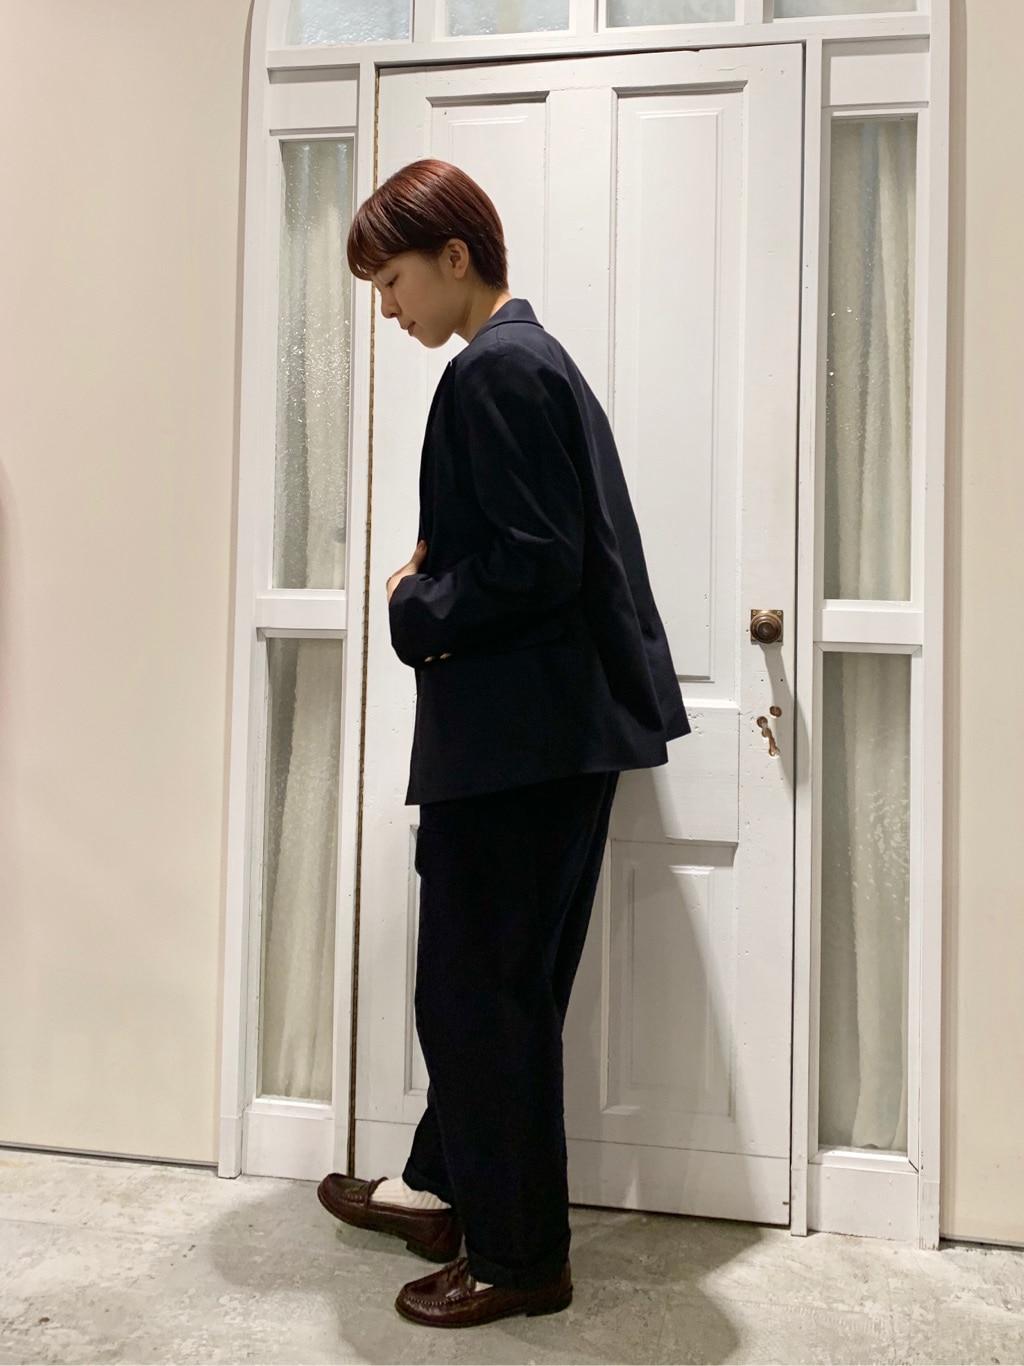 - CHILD WOMAN CHILD WOMAN , PAR ICI ルミネ横浜 身長:158cm 2020.10.16